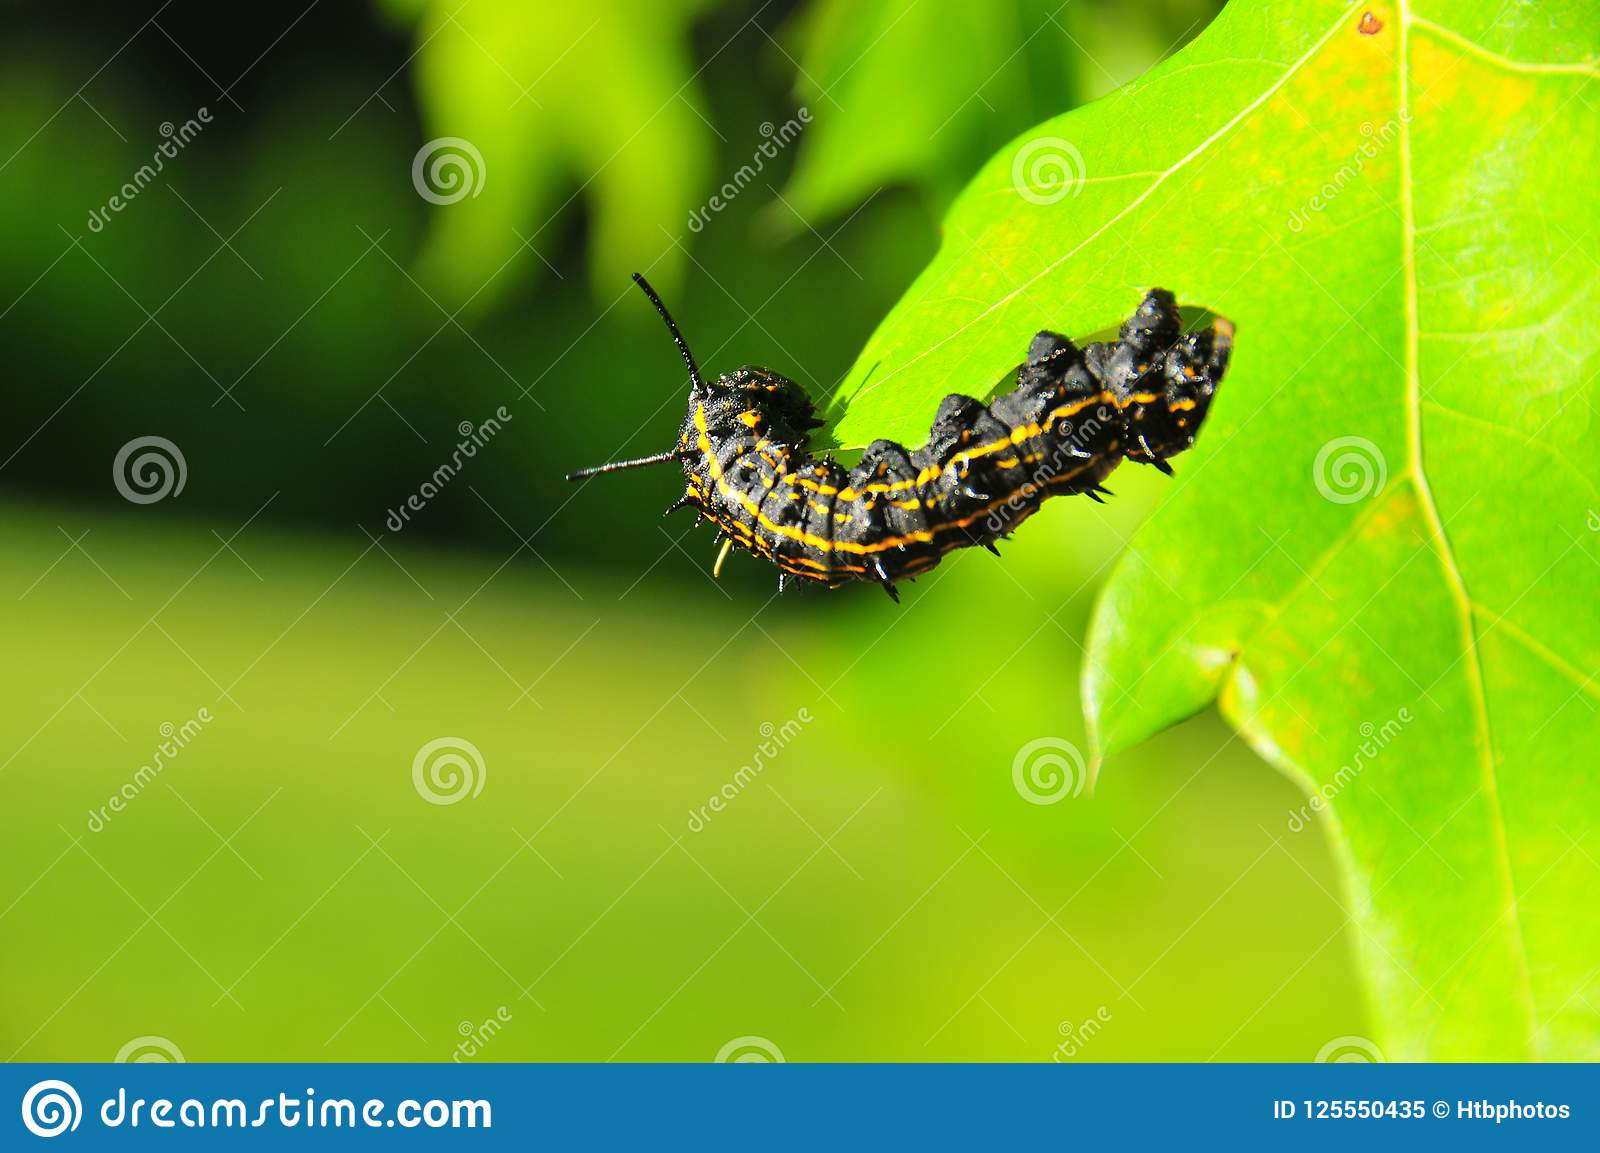 Caterpillar Black With Yellow Stripes Anisota Peigleri Stock Image Image Of Explorer Background 125550435